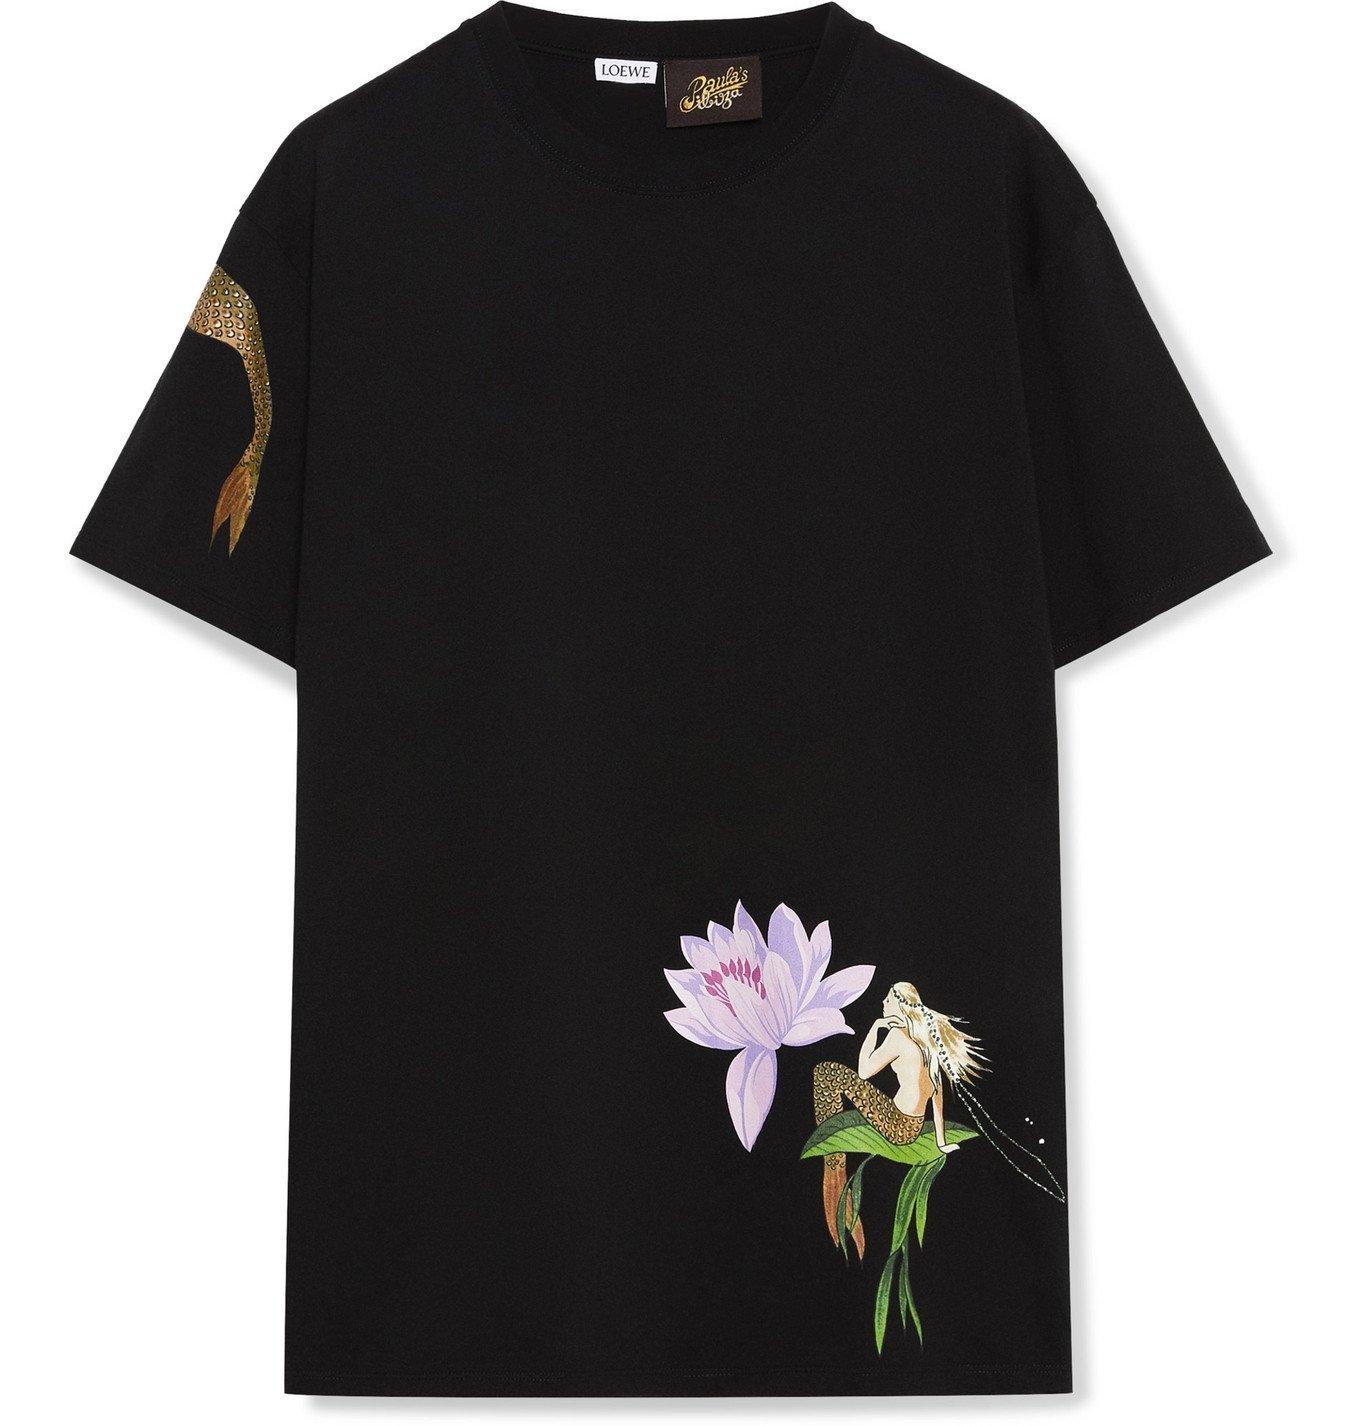 Photo: Loewe - Paula's Ibiza Printed Cotton-Jersey T-Shirt - Black